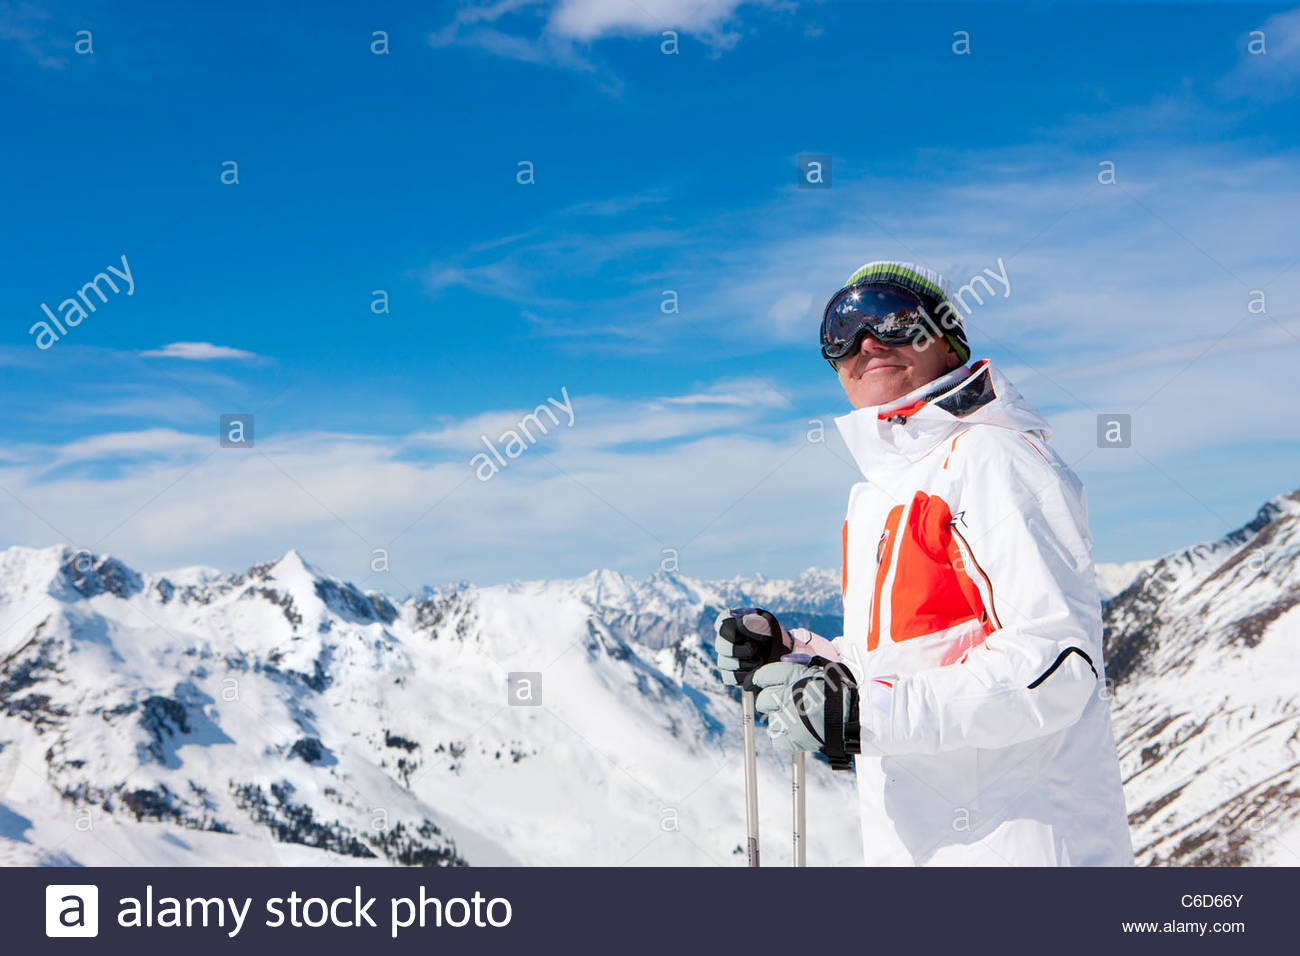 Smiling man wearing ski goggles and holding ski poles on snowy mountain - Stock Image